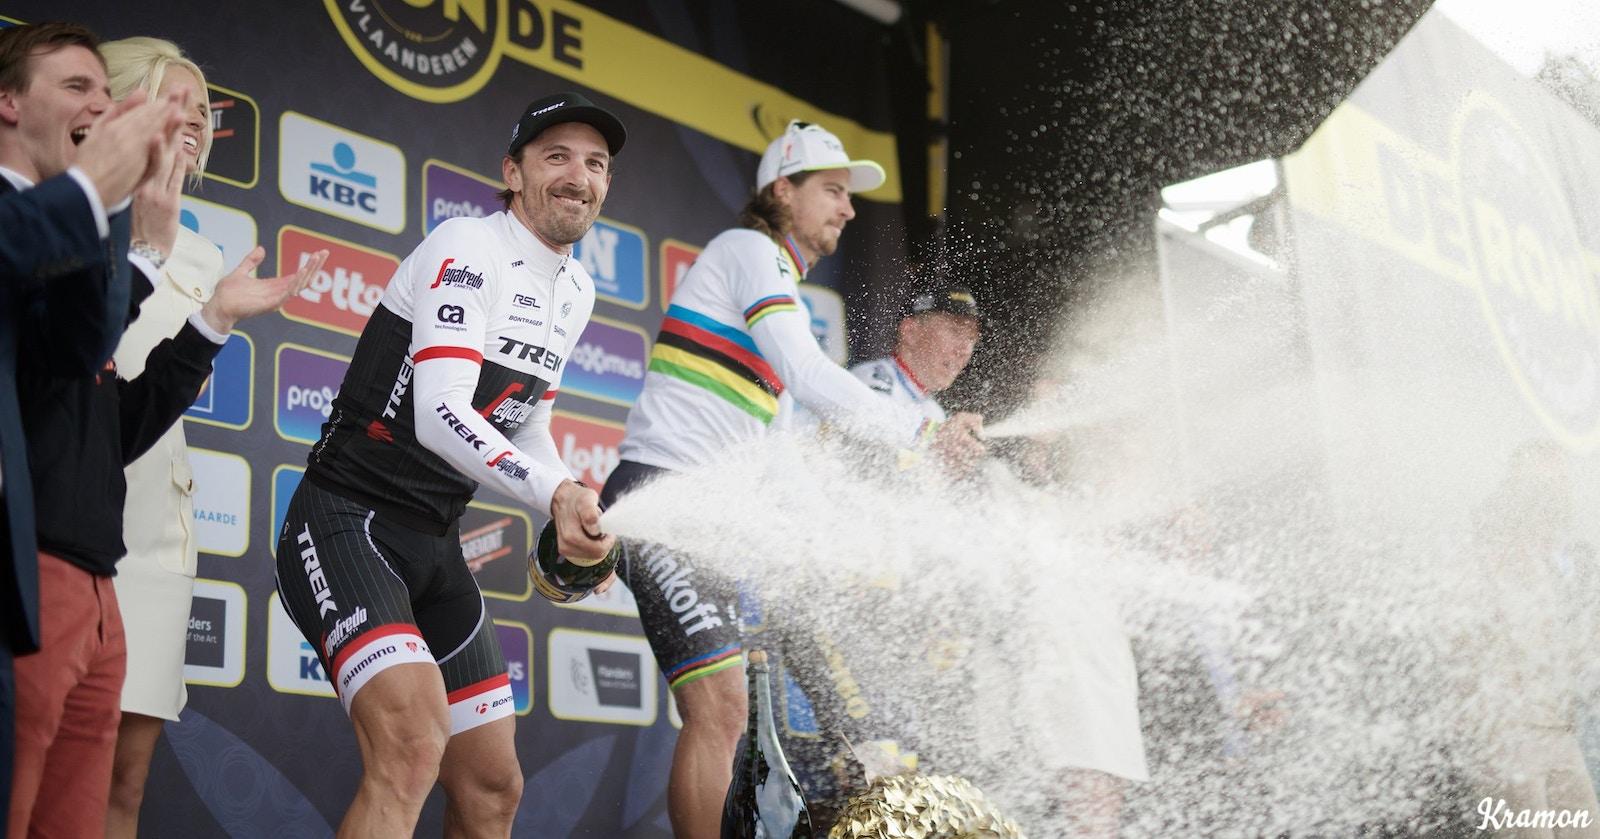 Photo Gallery: 2016 men's Tour of Flanders